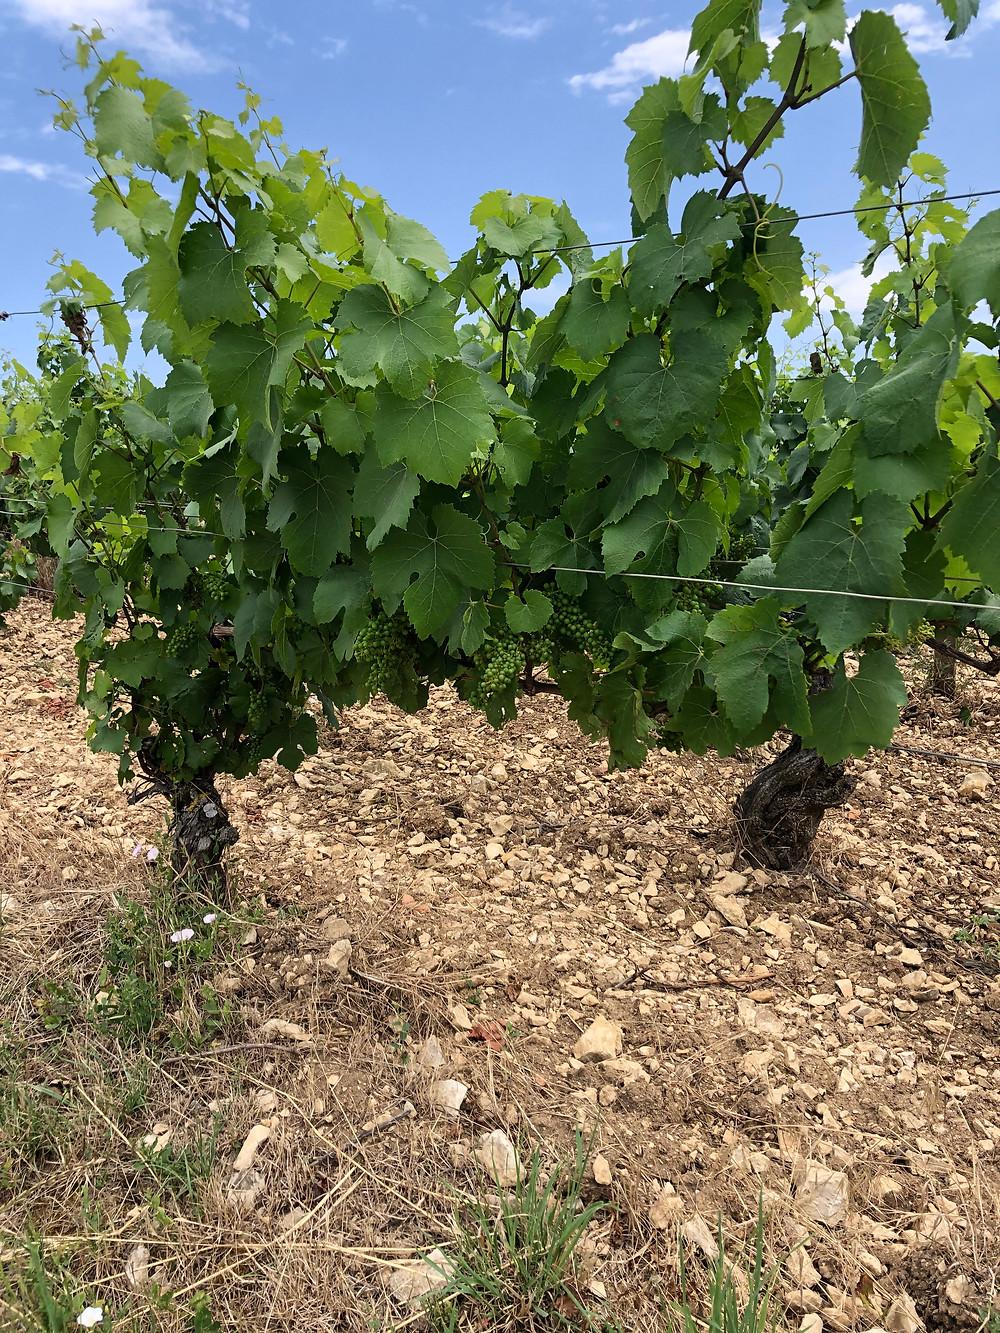 Chardonnay vineyard in Chablis Grand Cru during a wine study trip to Chablis and a vineyard tour